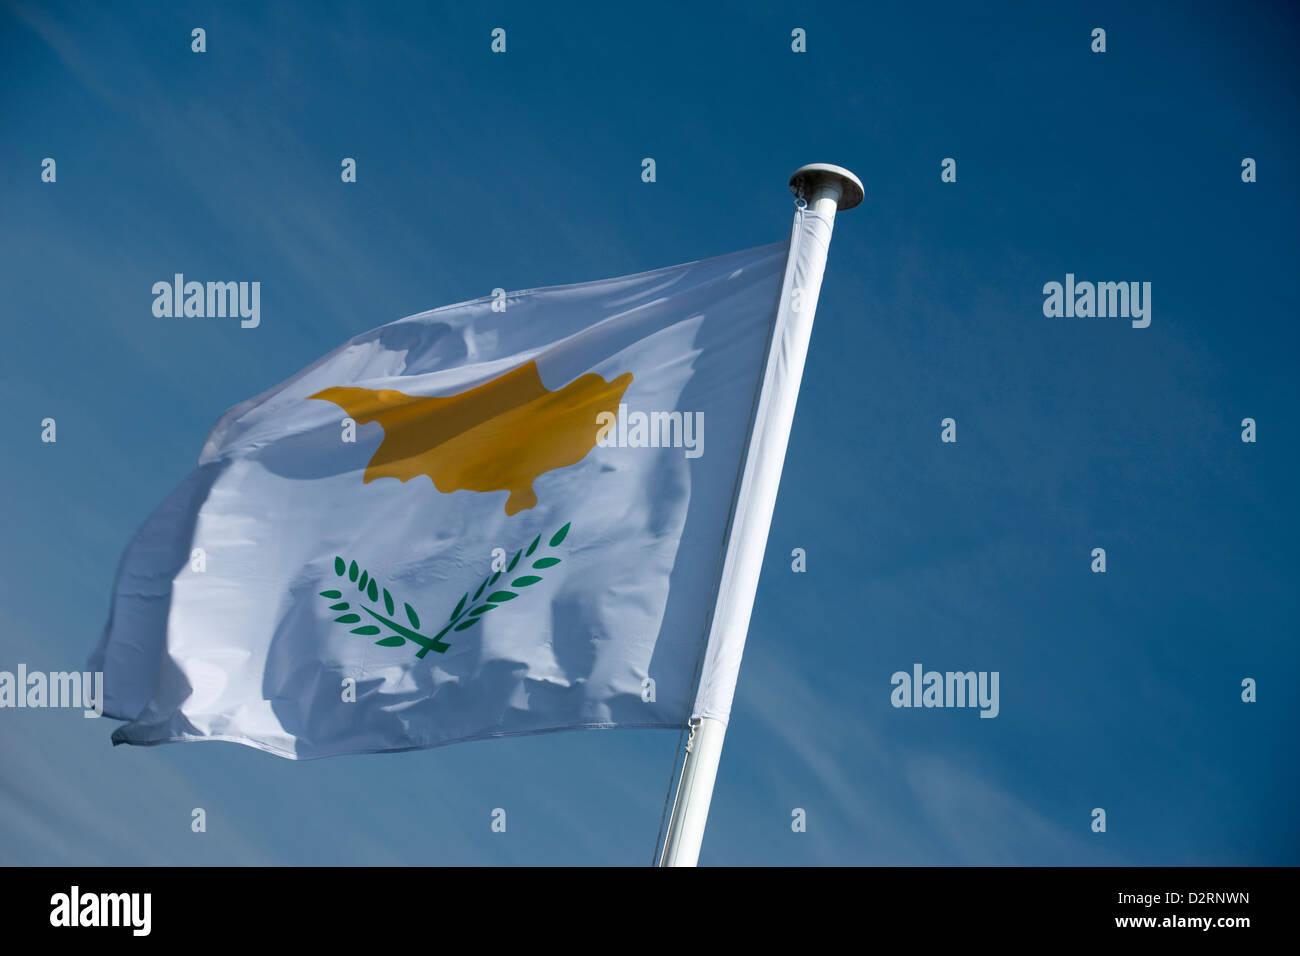 REPUBLIC OF CYPRESS FLAG FLYING ON FLAGPOLE - Stock Image